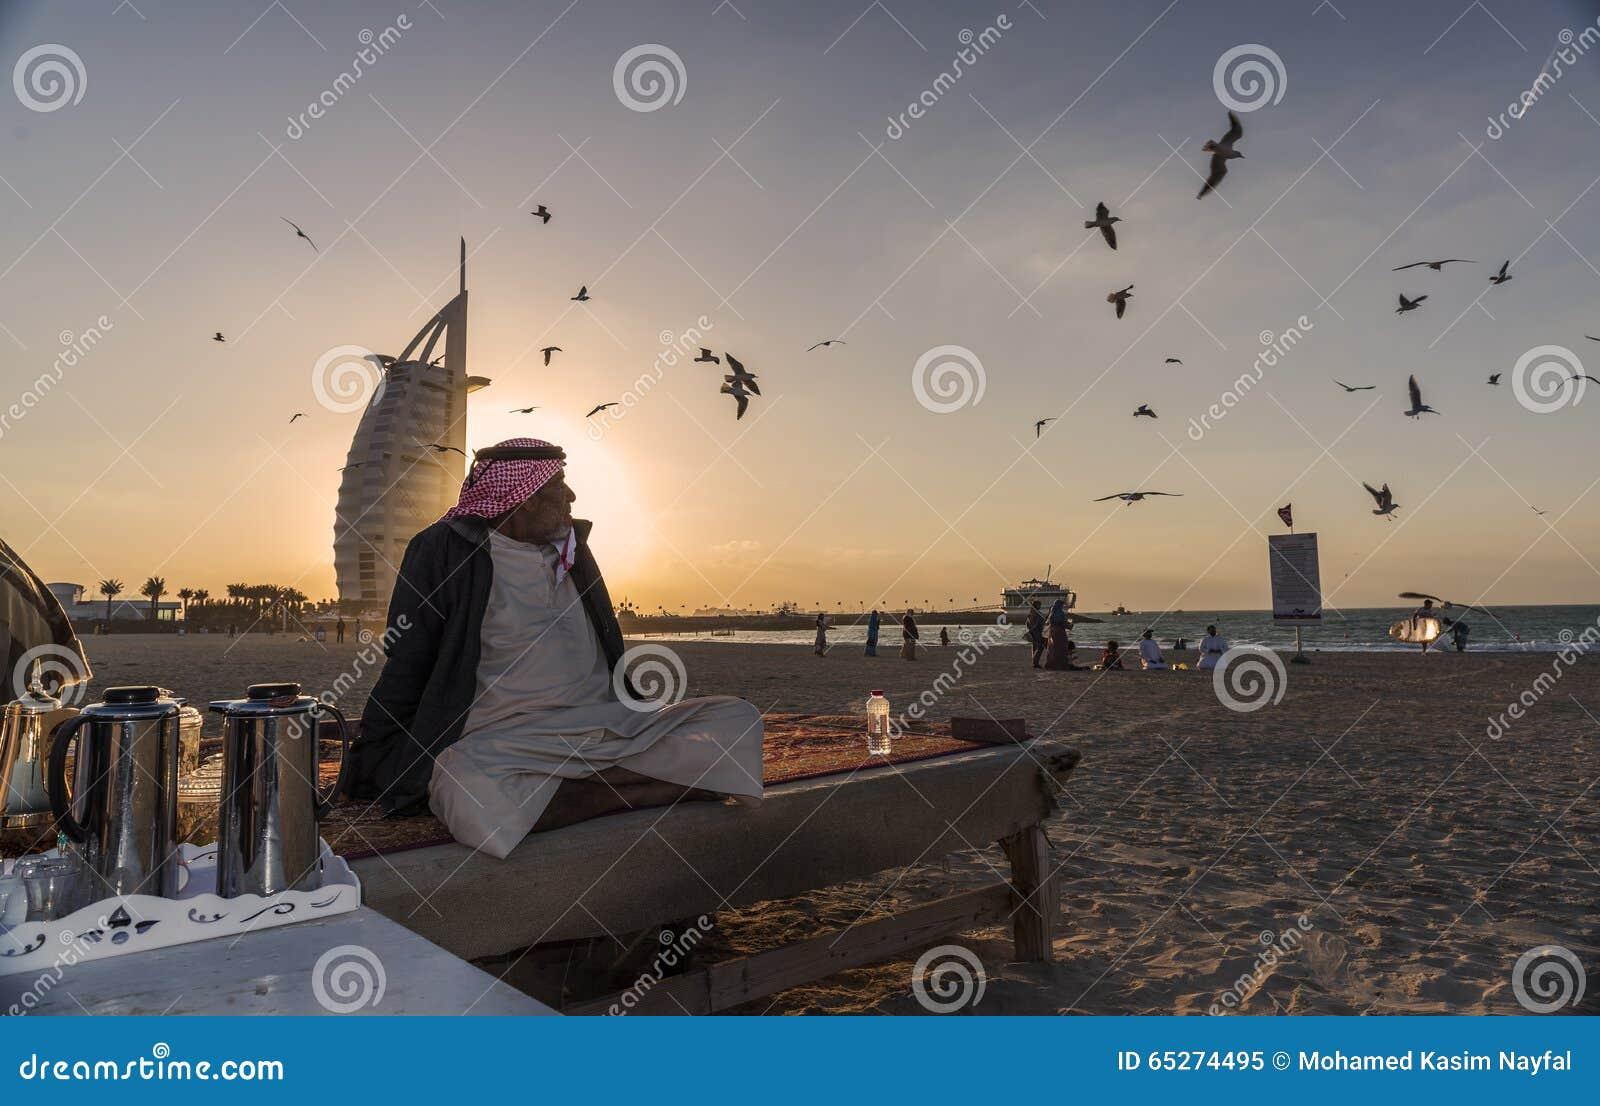 Old Arabic man sitting on the beach